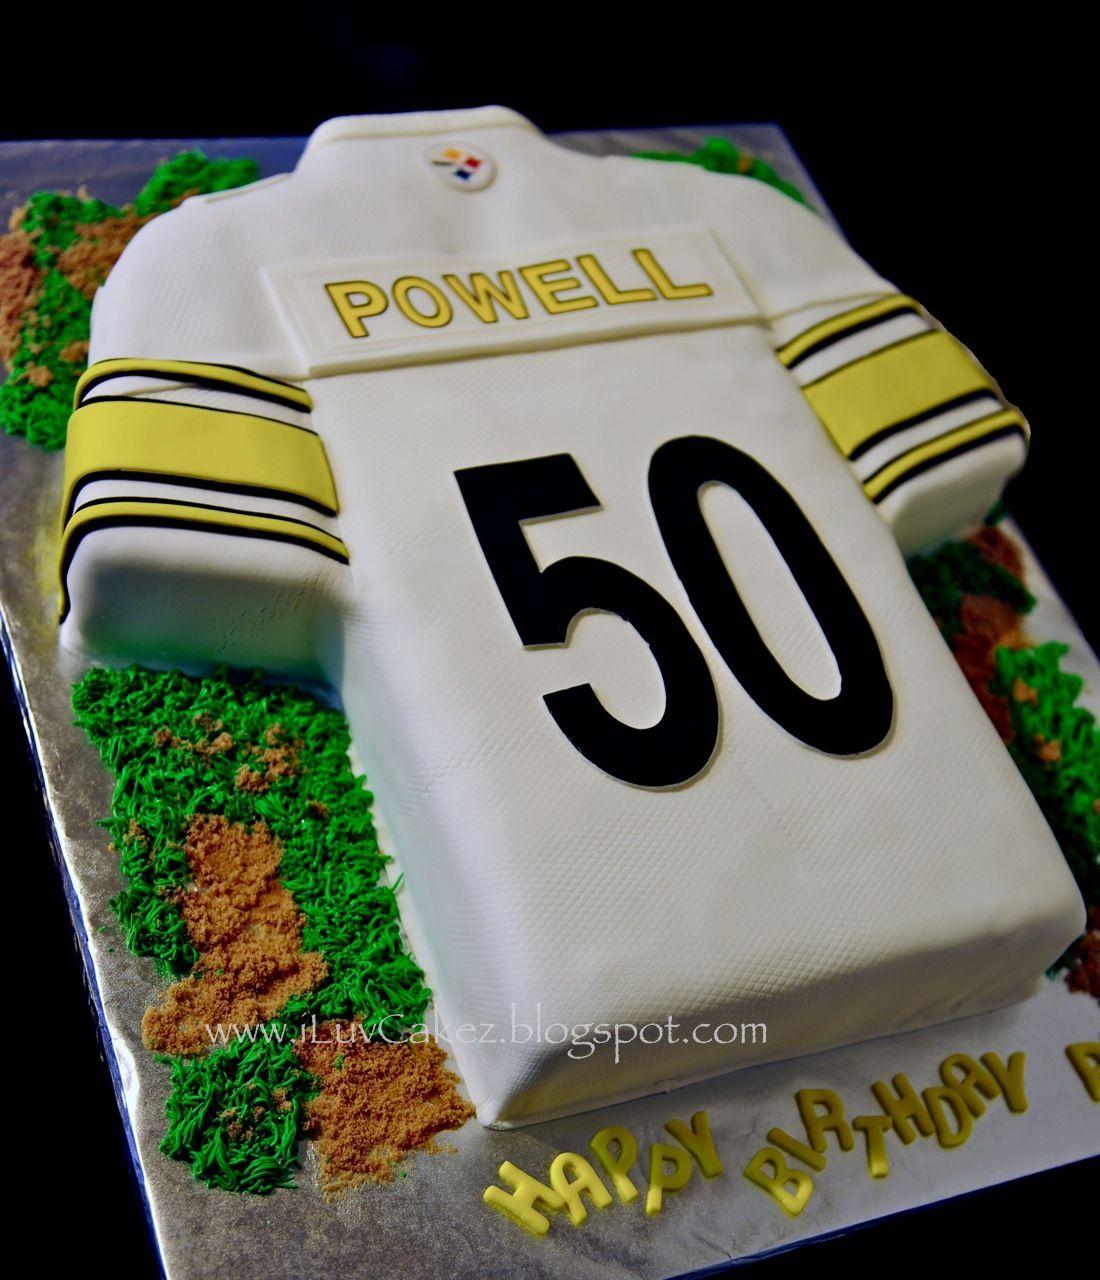 ILuv Cakez: Steeler's Jersey Cake (Randy's 50th Birthday